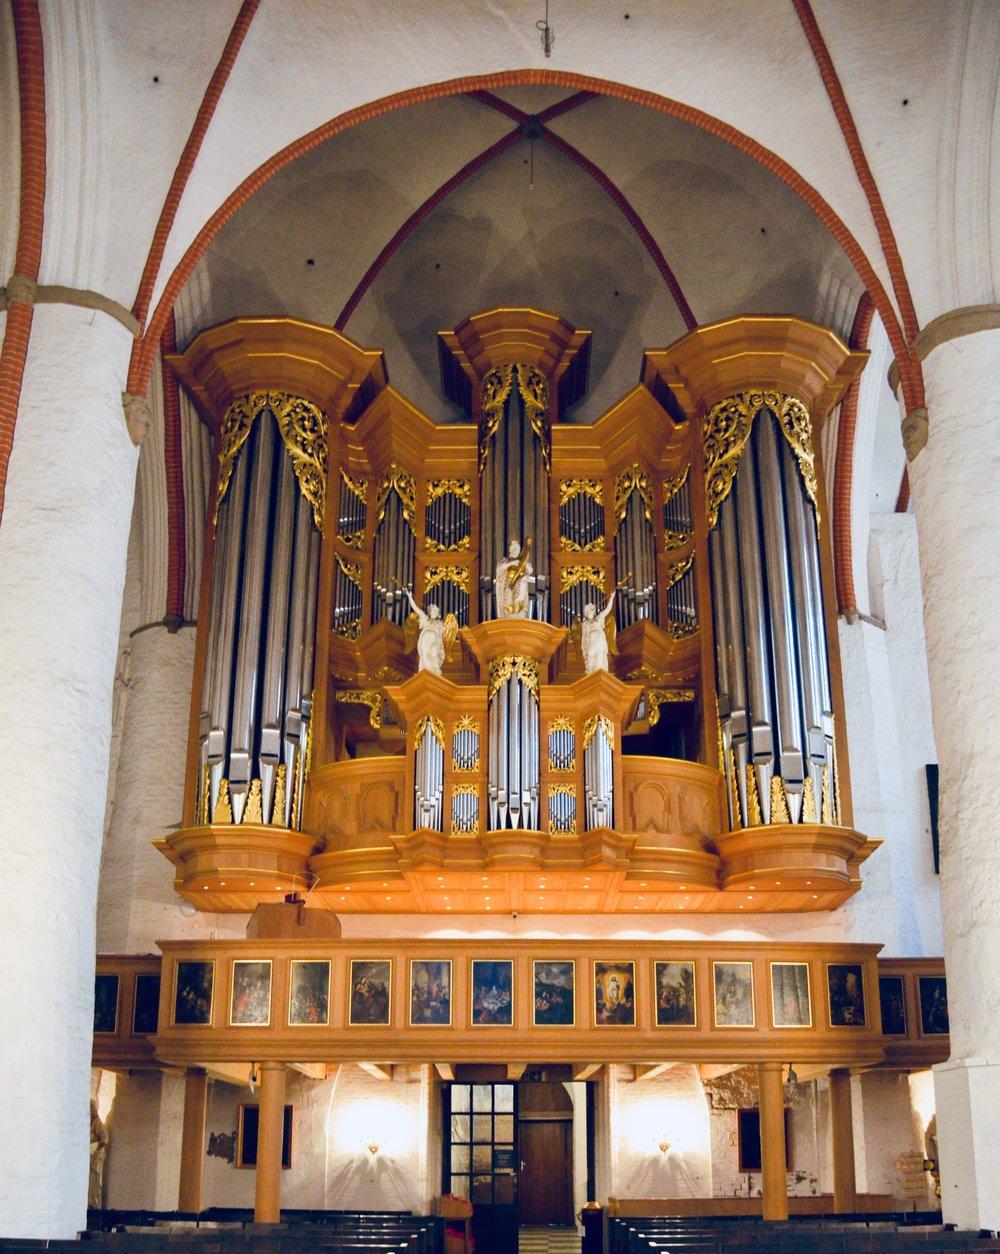 1693 Arp Schnitter organ in St. Jacobi, Hamburg, Germany,.